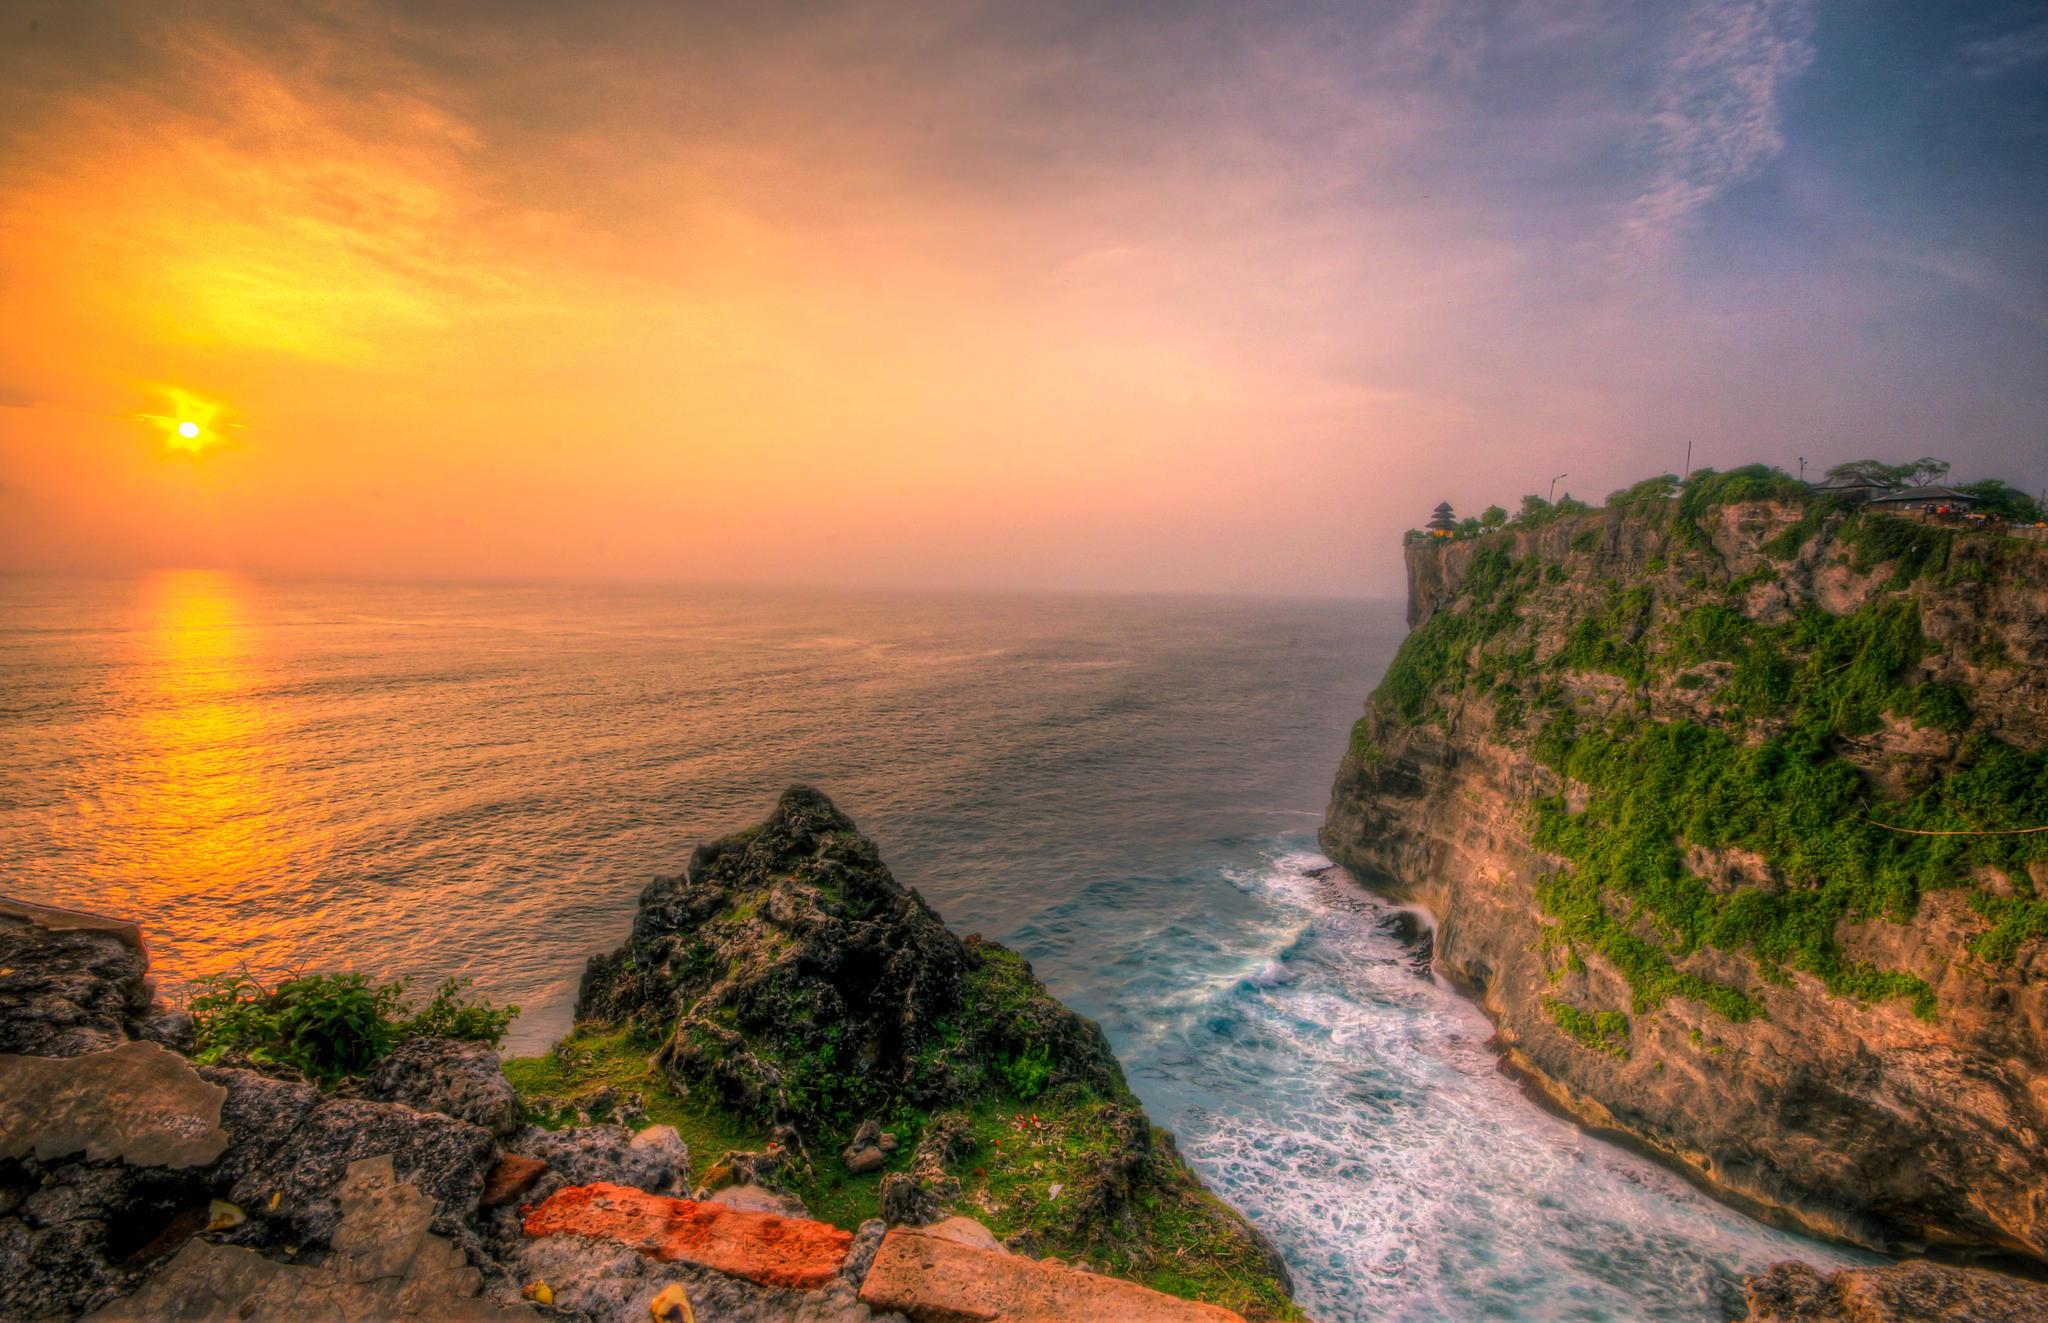 Under The Sea Wallpaper Hd Sunset Bali Tour Bali Tour Operators